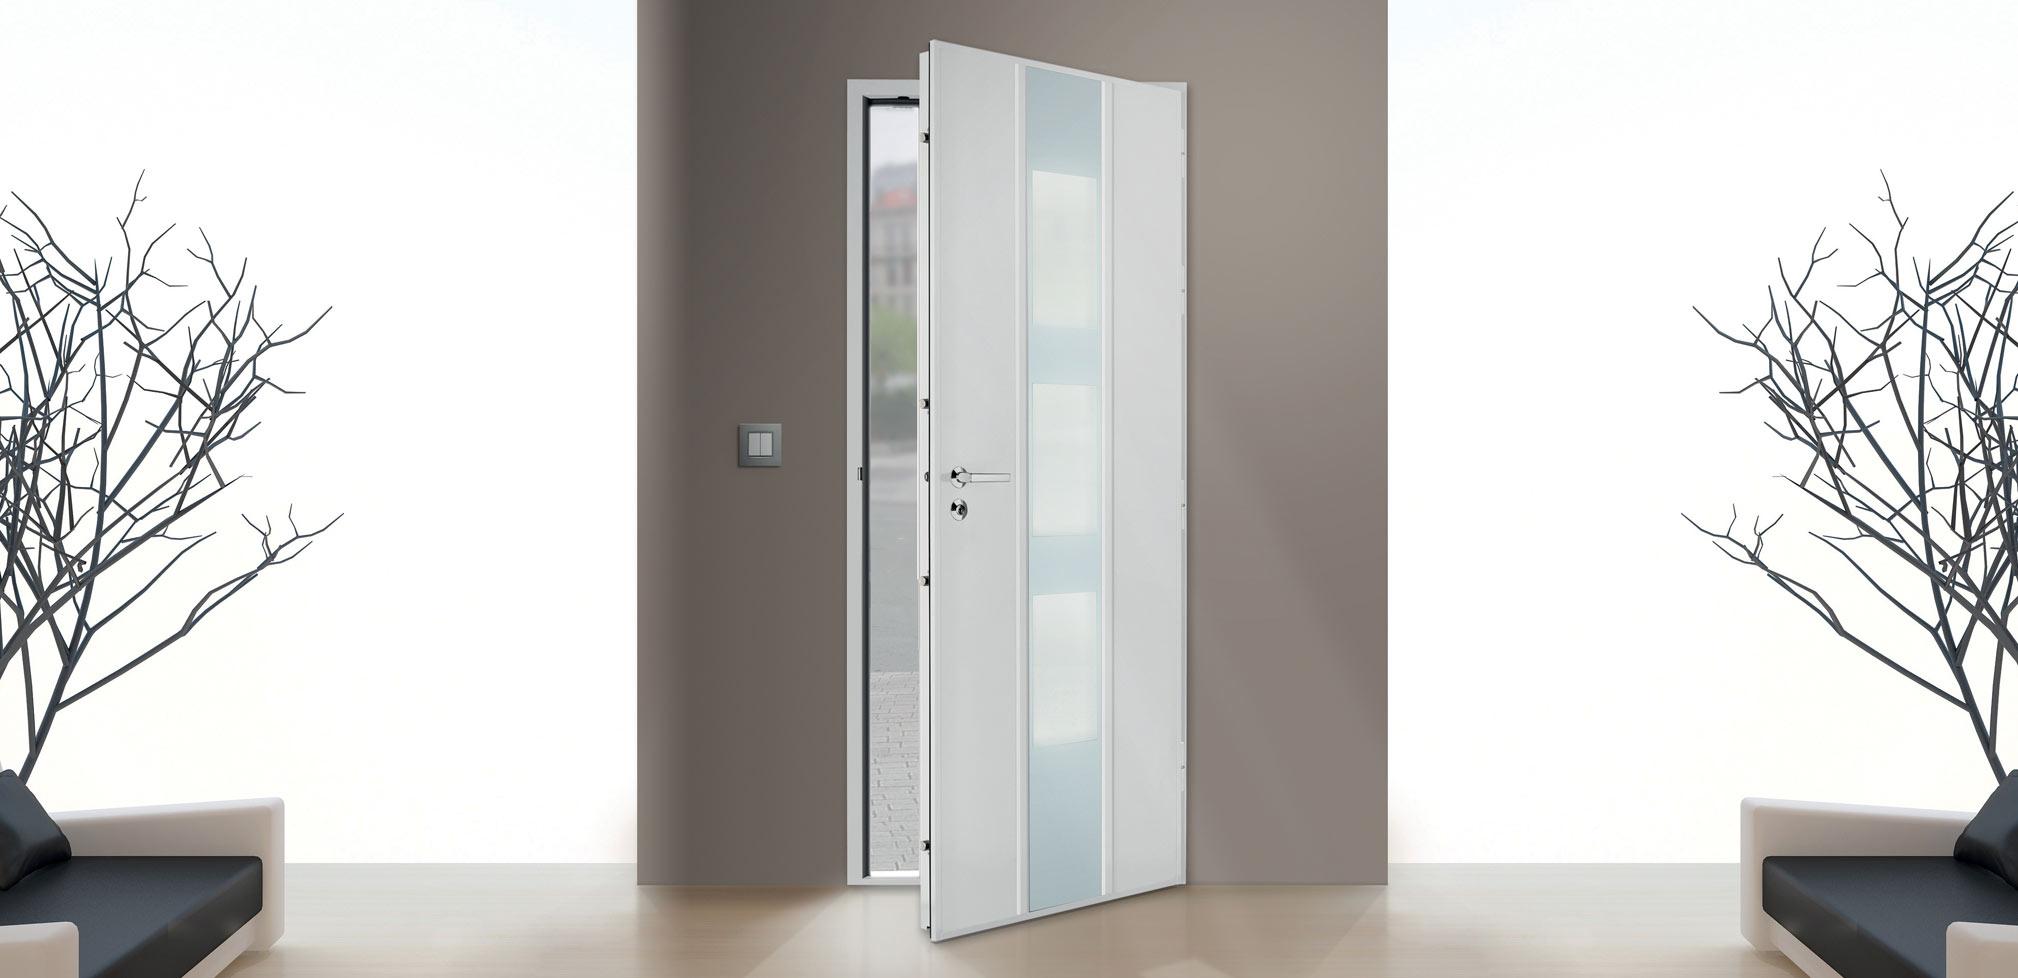 porte blind e picard pour maison paris 75005 home garde. Black Bedroom Furniture Sets. Home Design Ideas